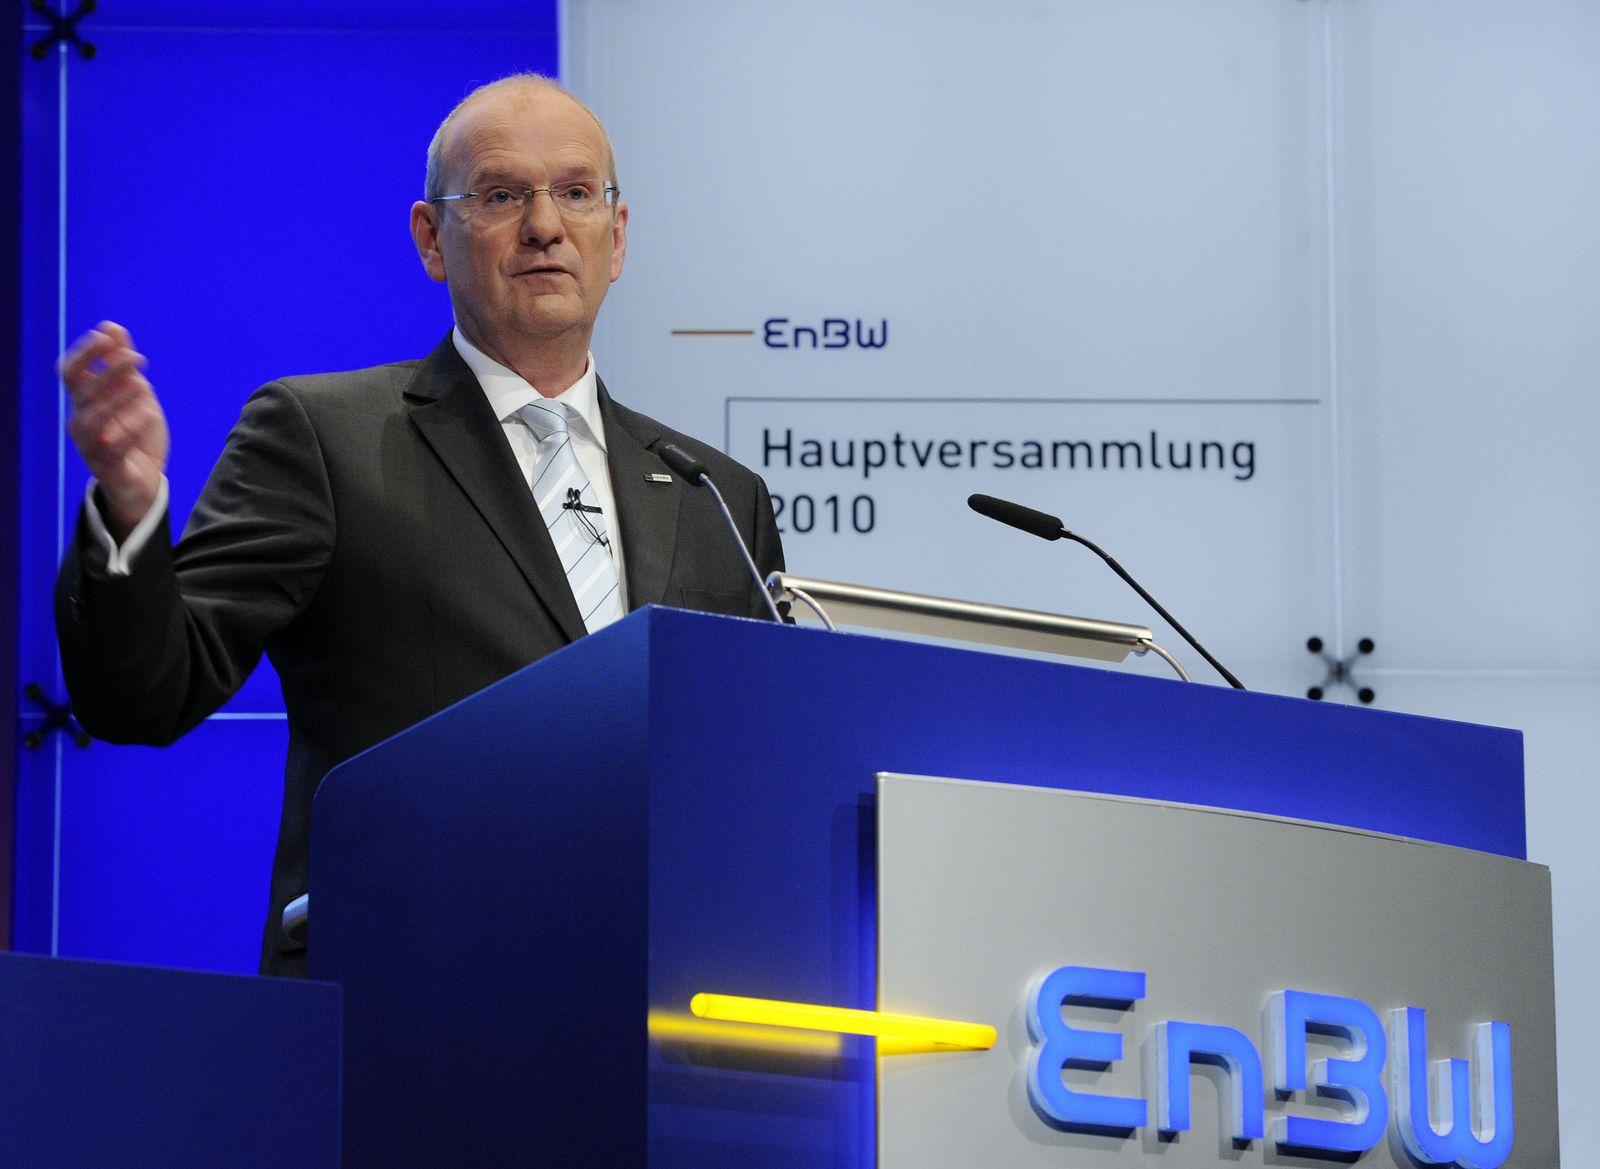 EnBW - Hauptversammlung 2010